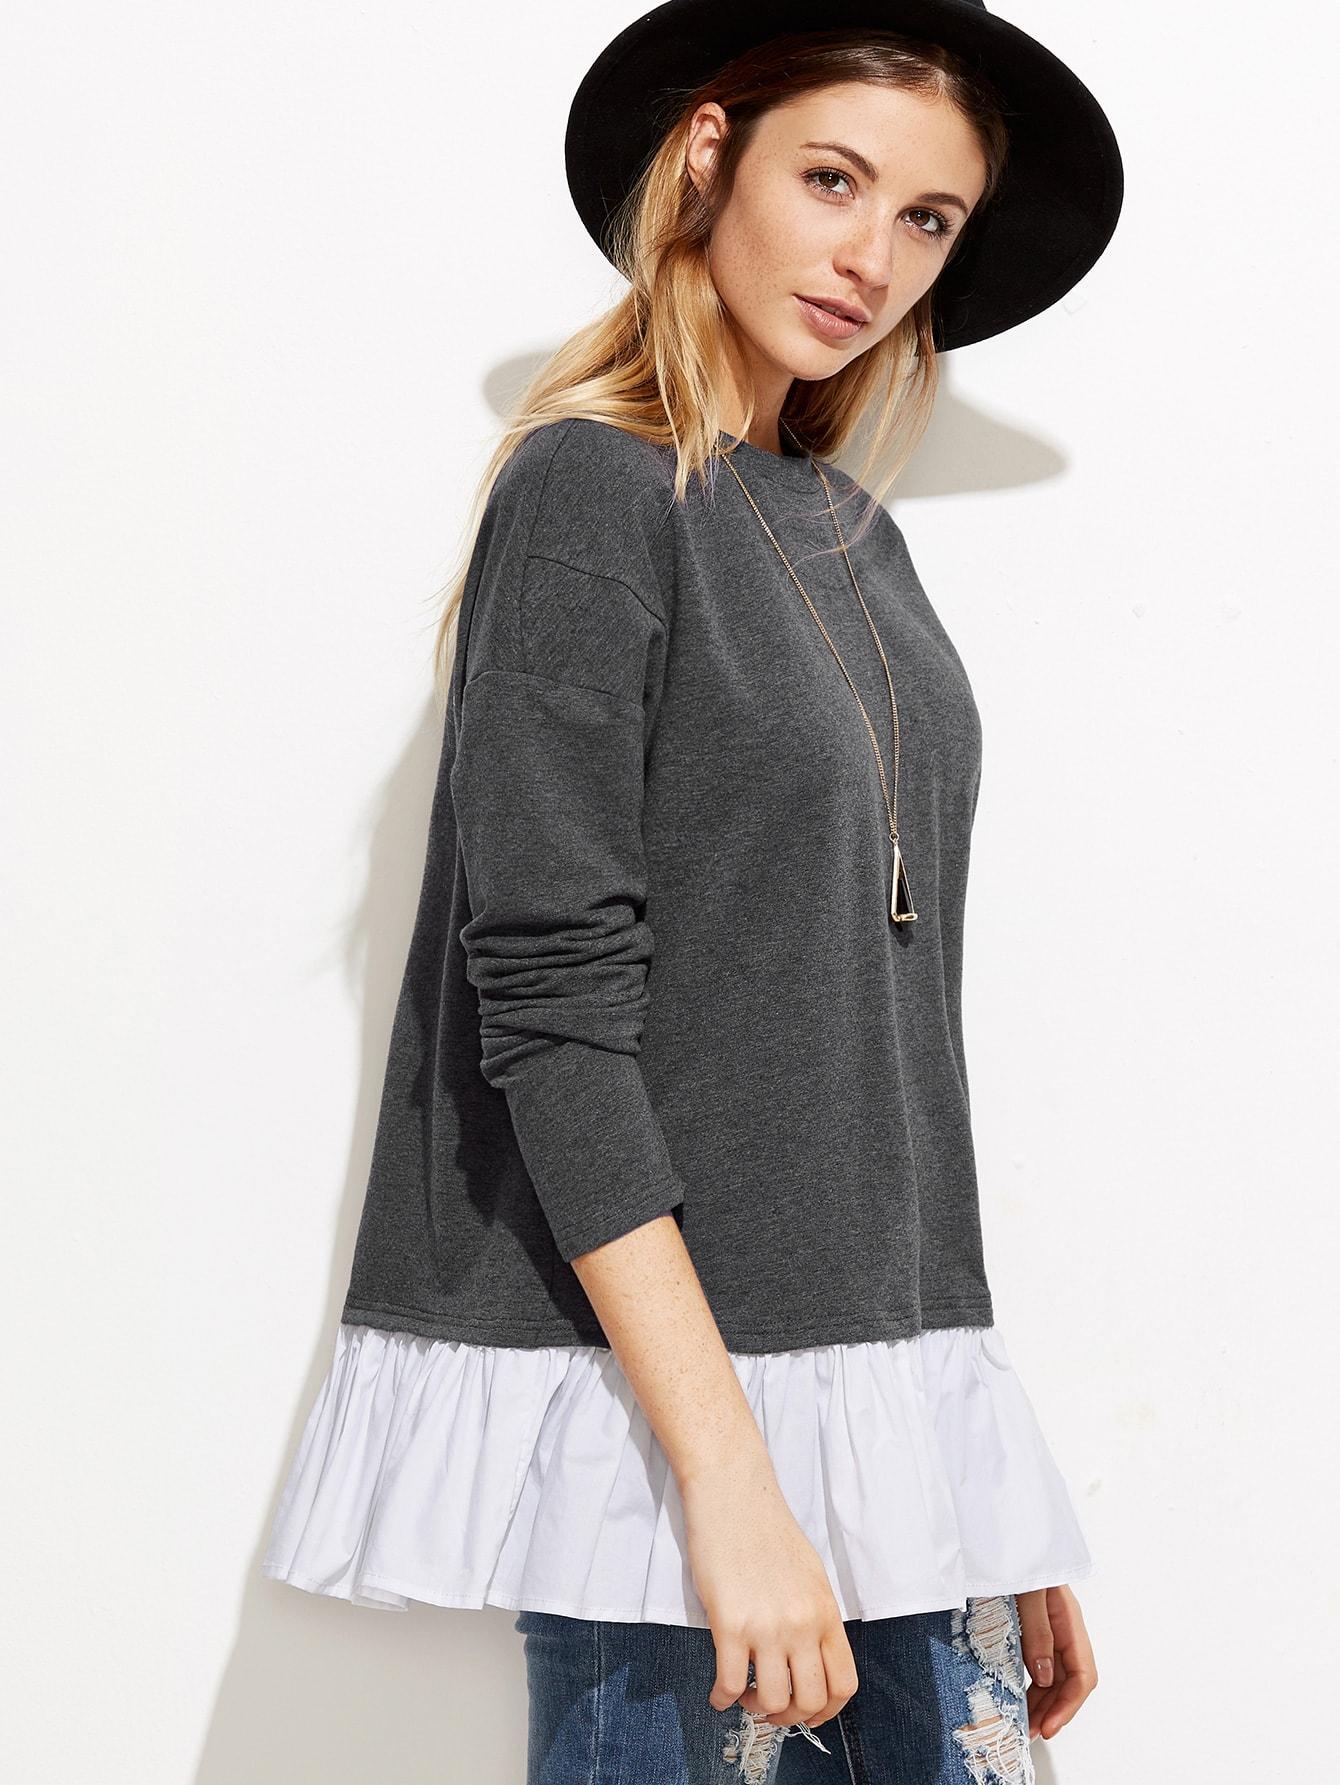 Grey Drop Shoulder Contrast Ruffle Trim SweatshirtGrey Drop Shoulder Contrast Ruffle Trim Sweatshirt<br><br>color: Grey<br>size: L,S,XS